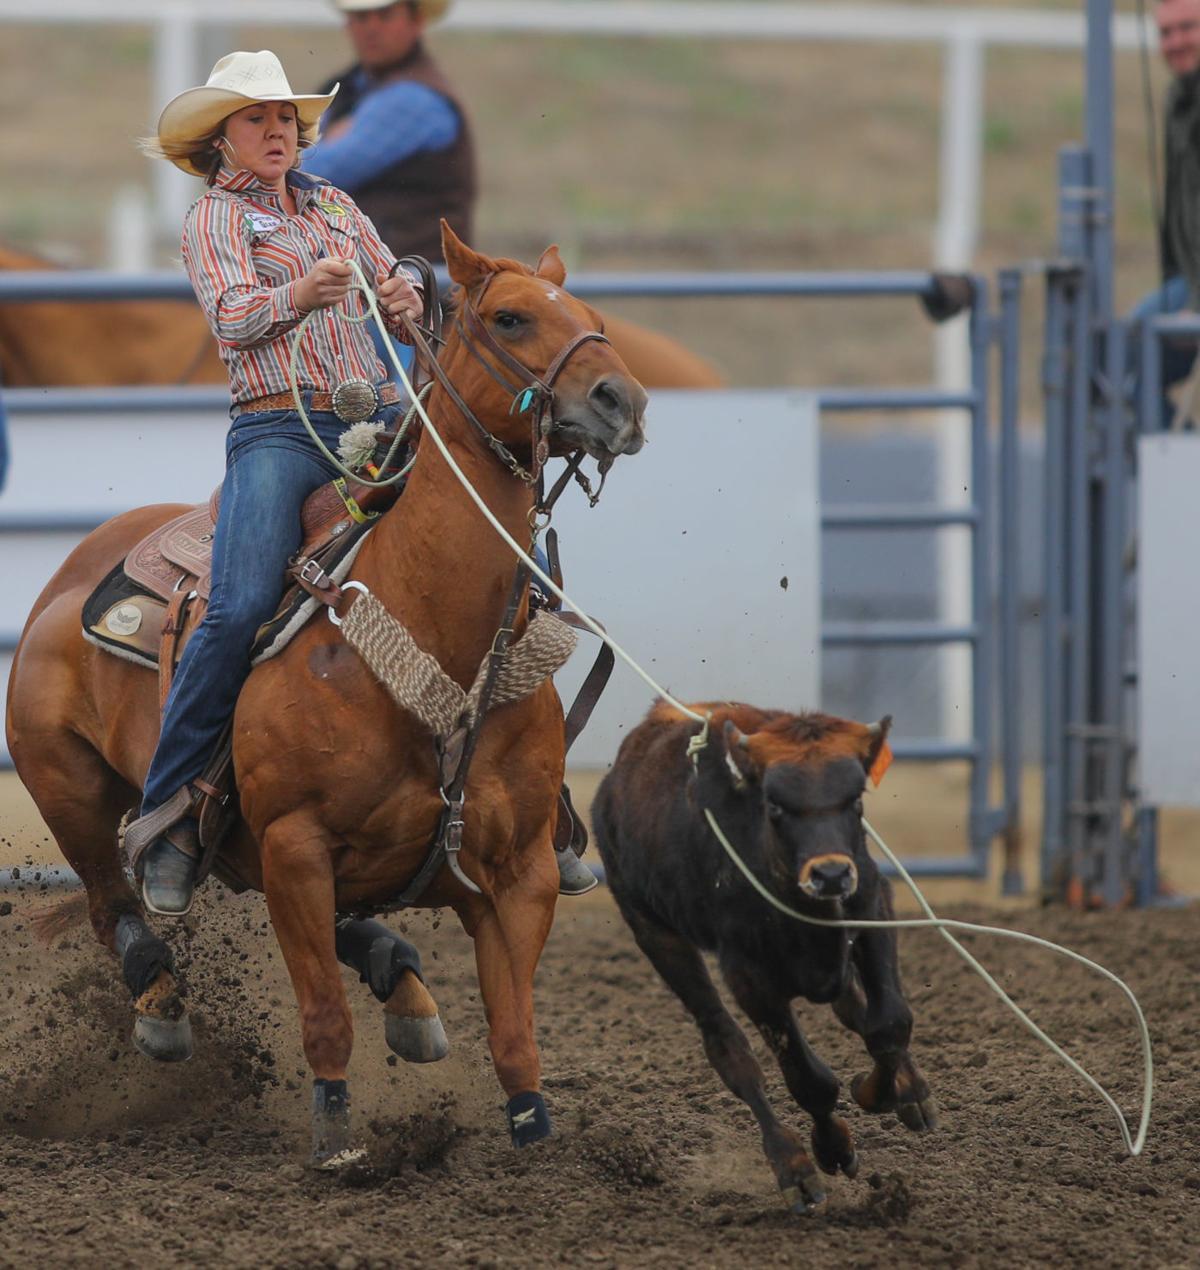 060219 Elks Rodeo Sunday 21.jpg